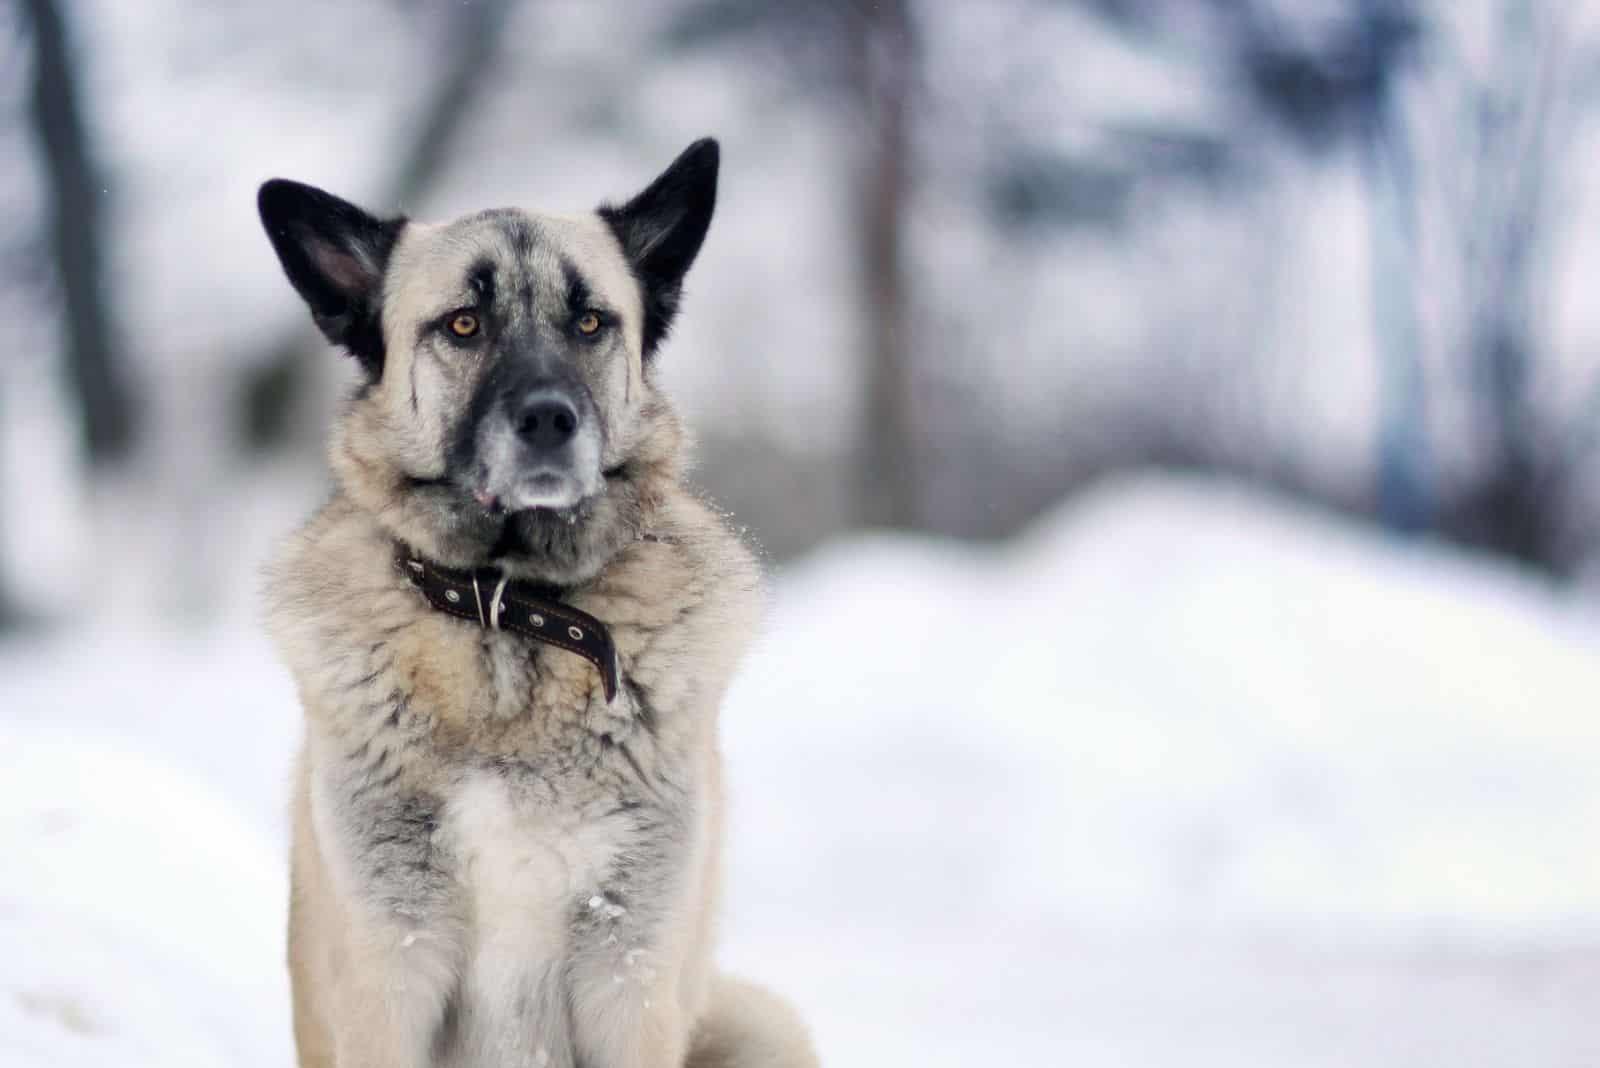 portrait of german shepherd dog standing in the snowy forest